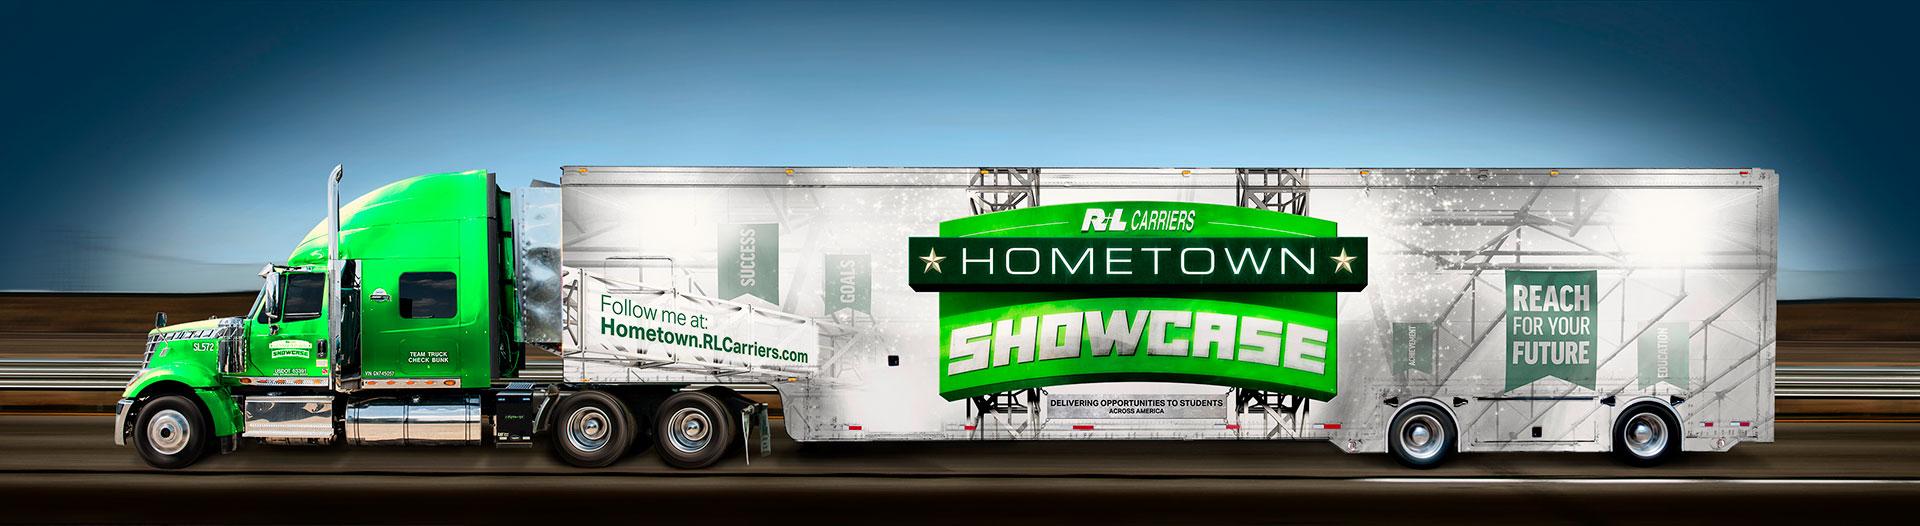 R+L Carriers, Hometown Showcase Hauler